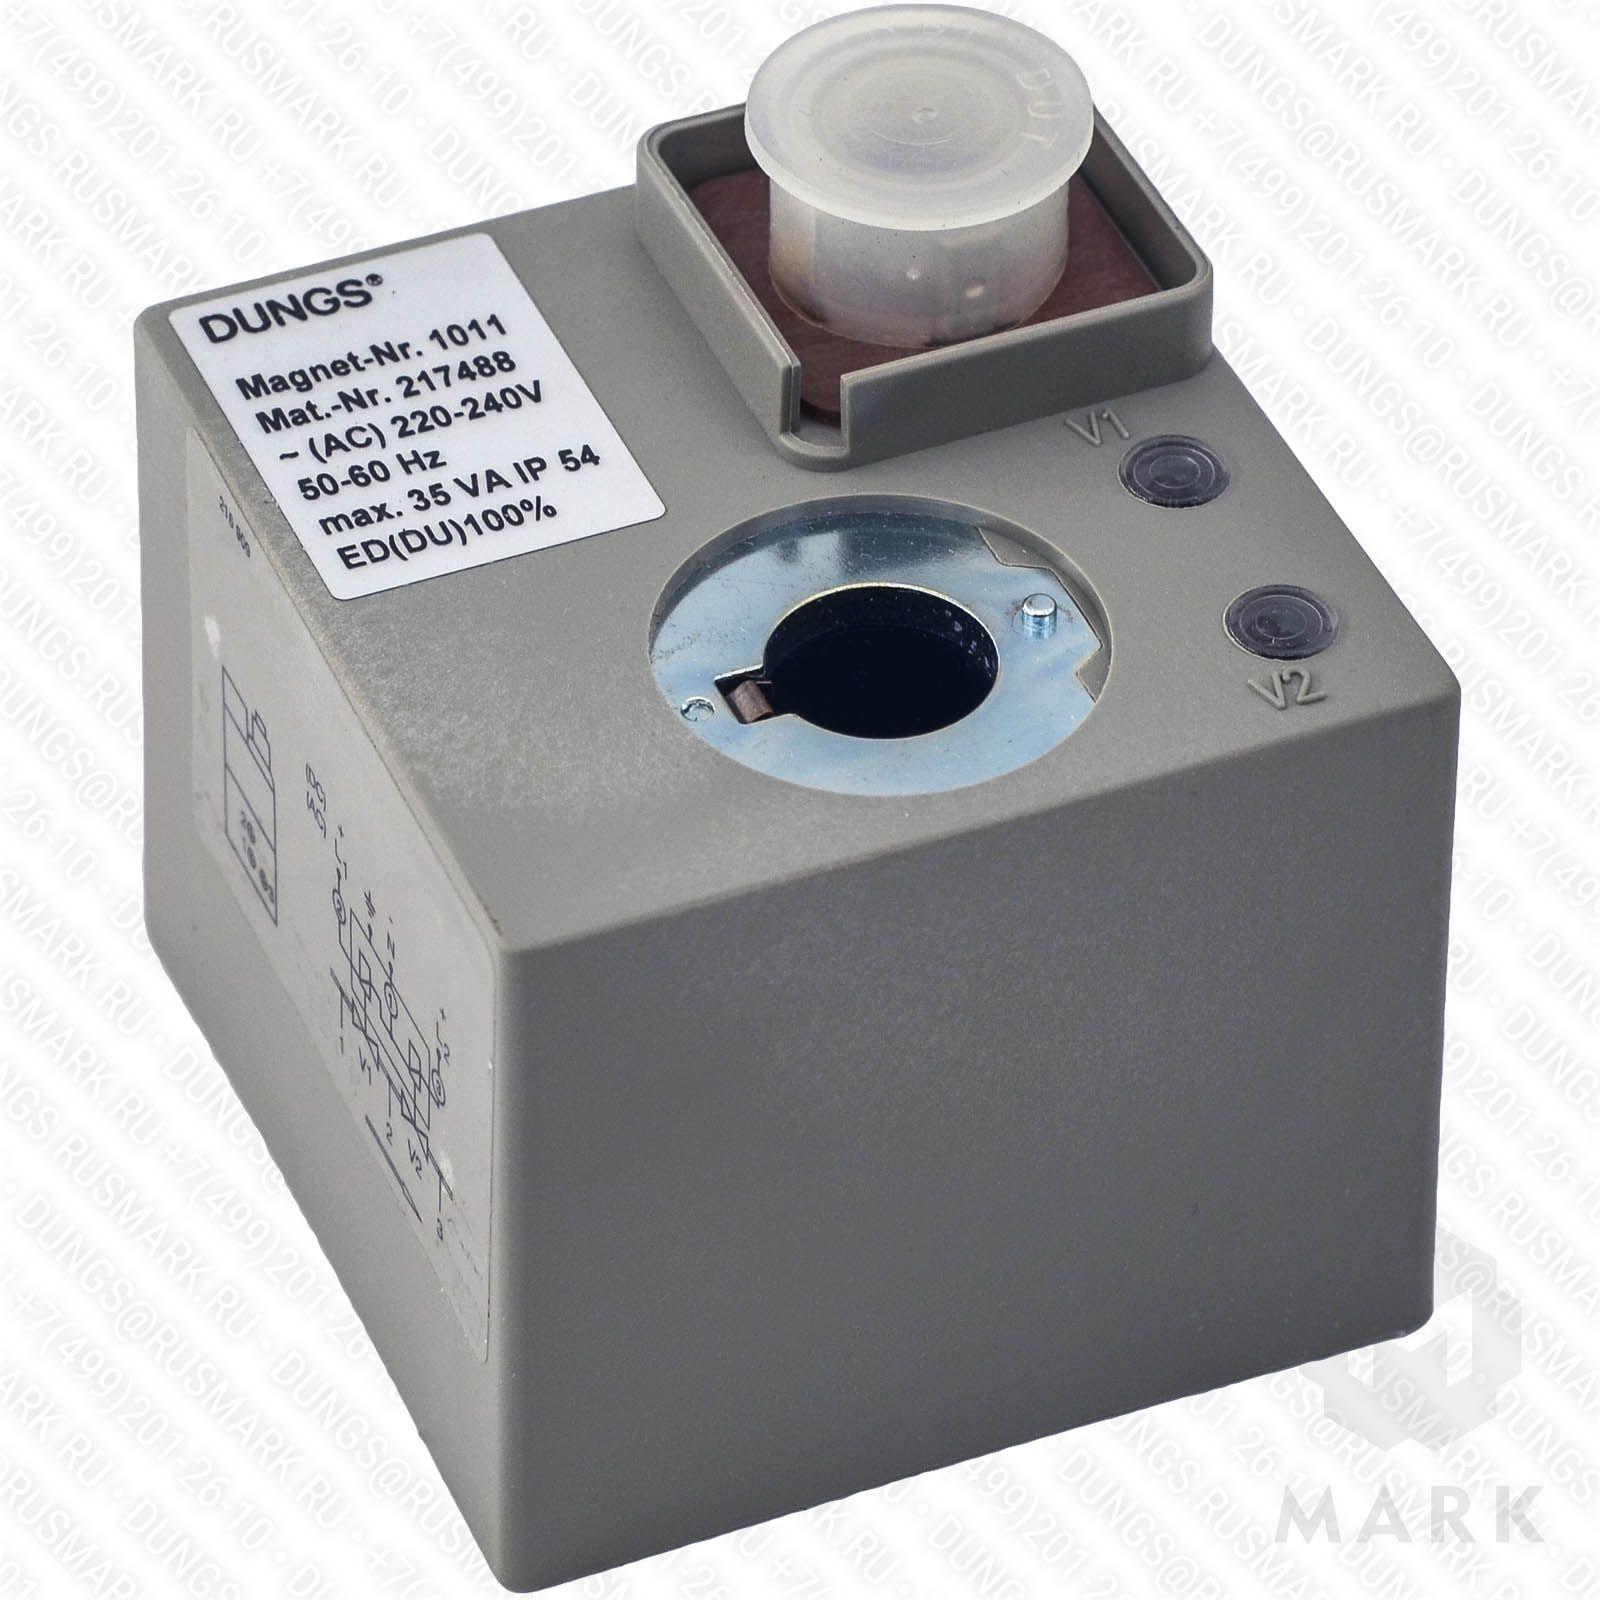 full_224980 Электромагнитная катушка №1011 арт.224980 DUNGS цена, купить